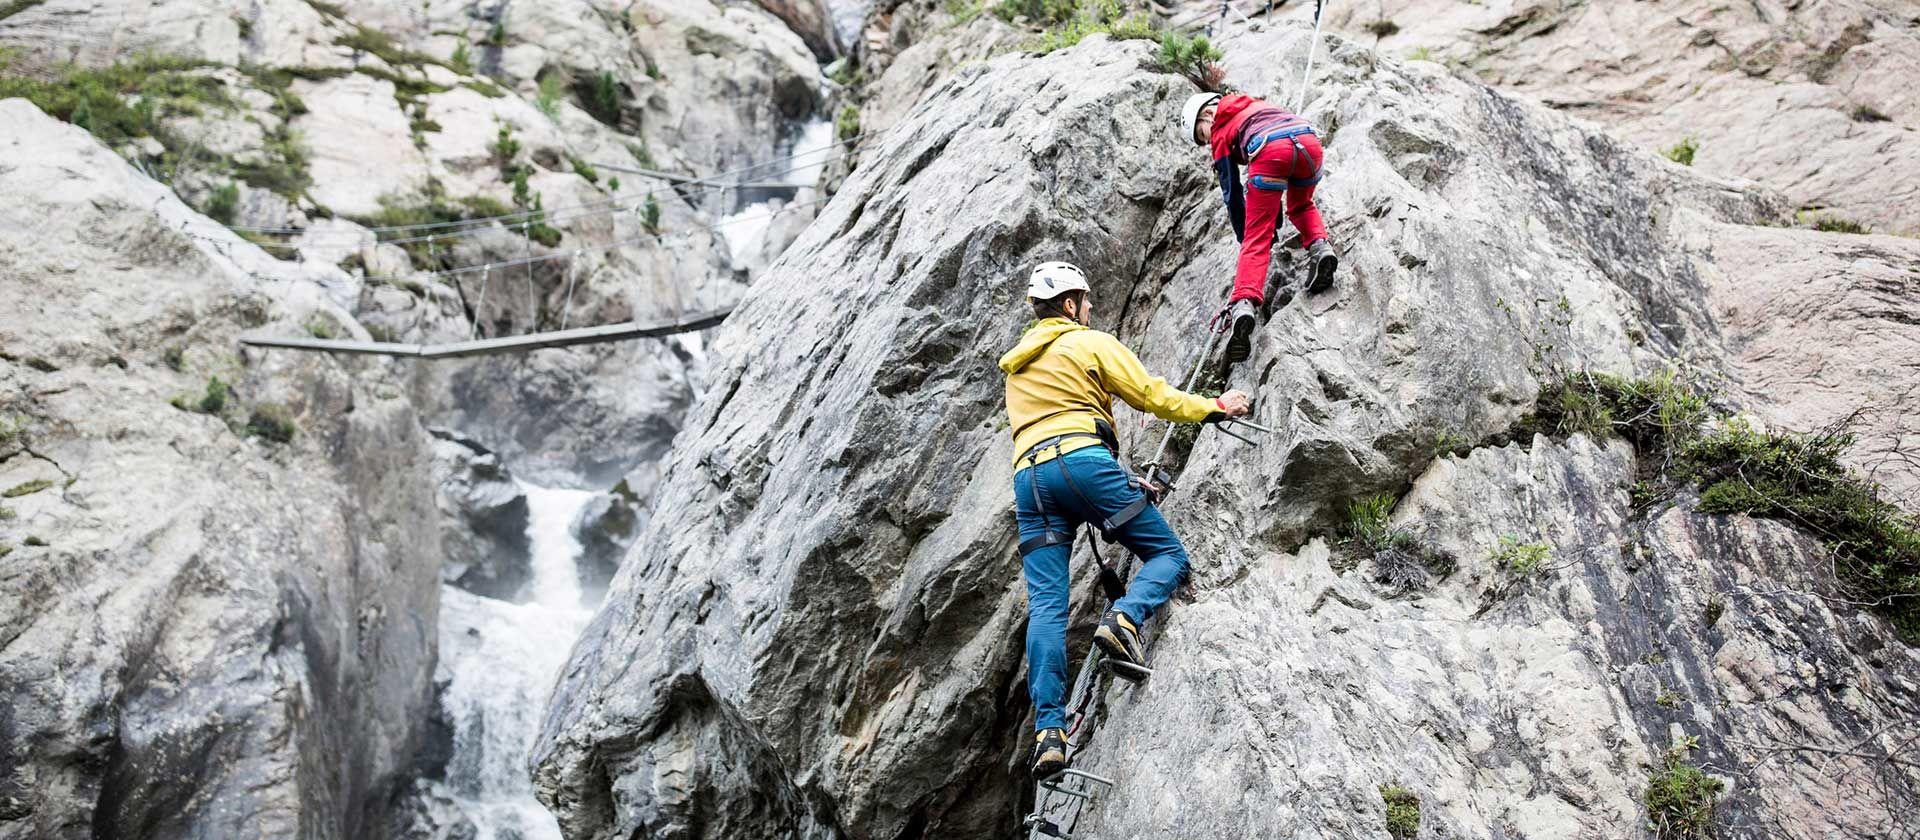 Klettern Foto: Kaunertaler Gletscher, Daniel Zangerl